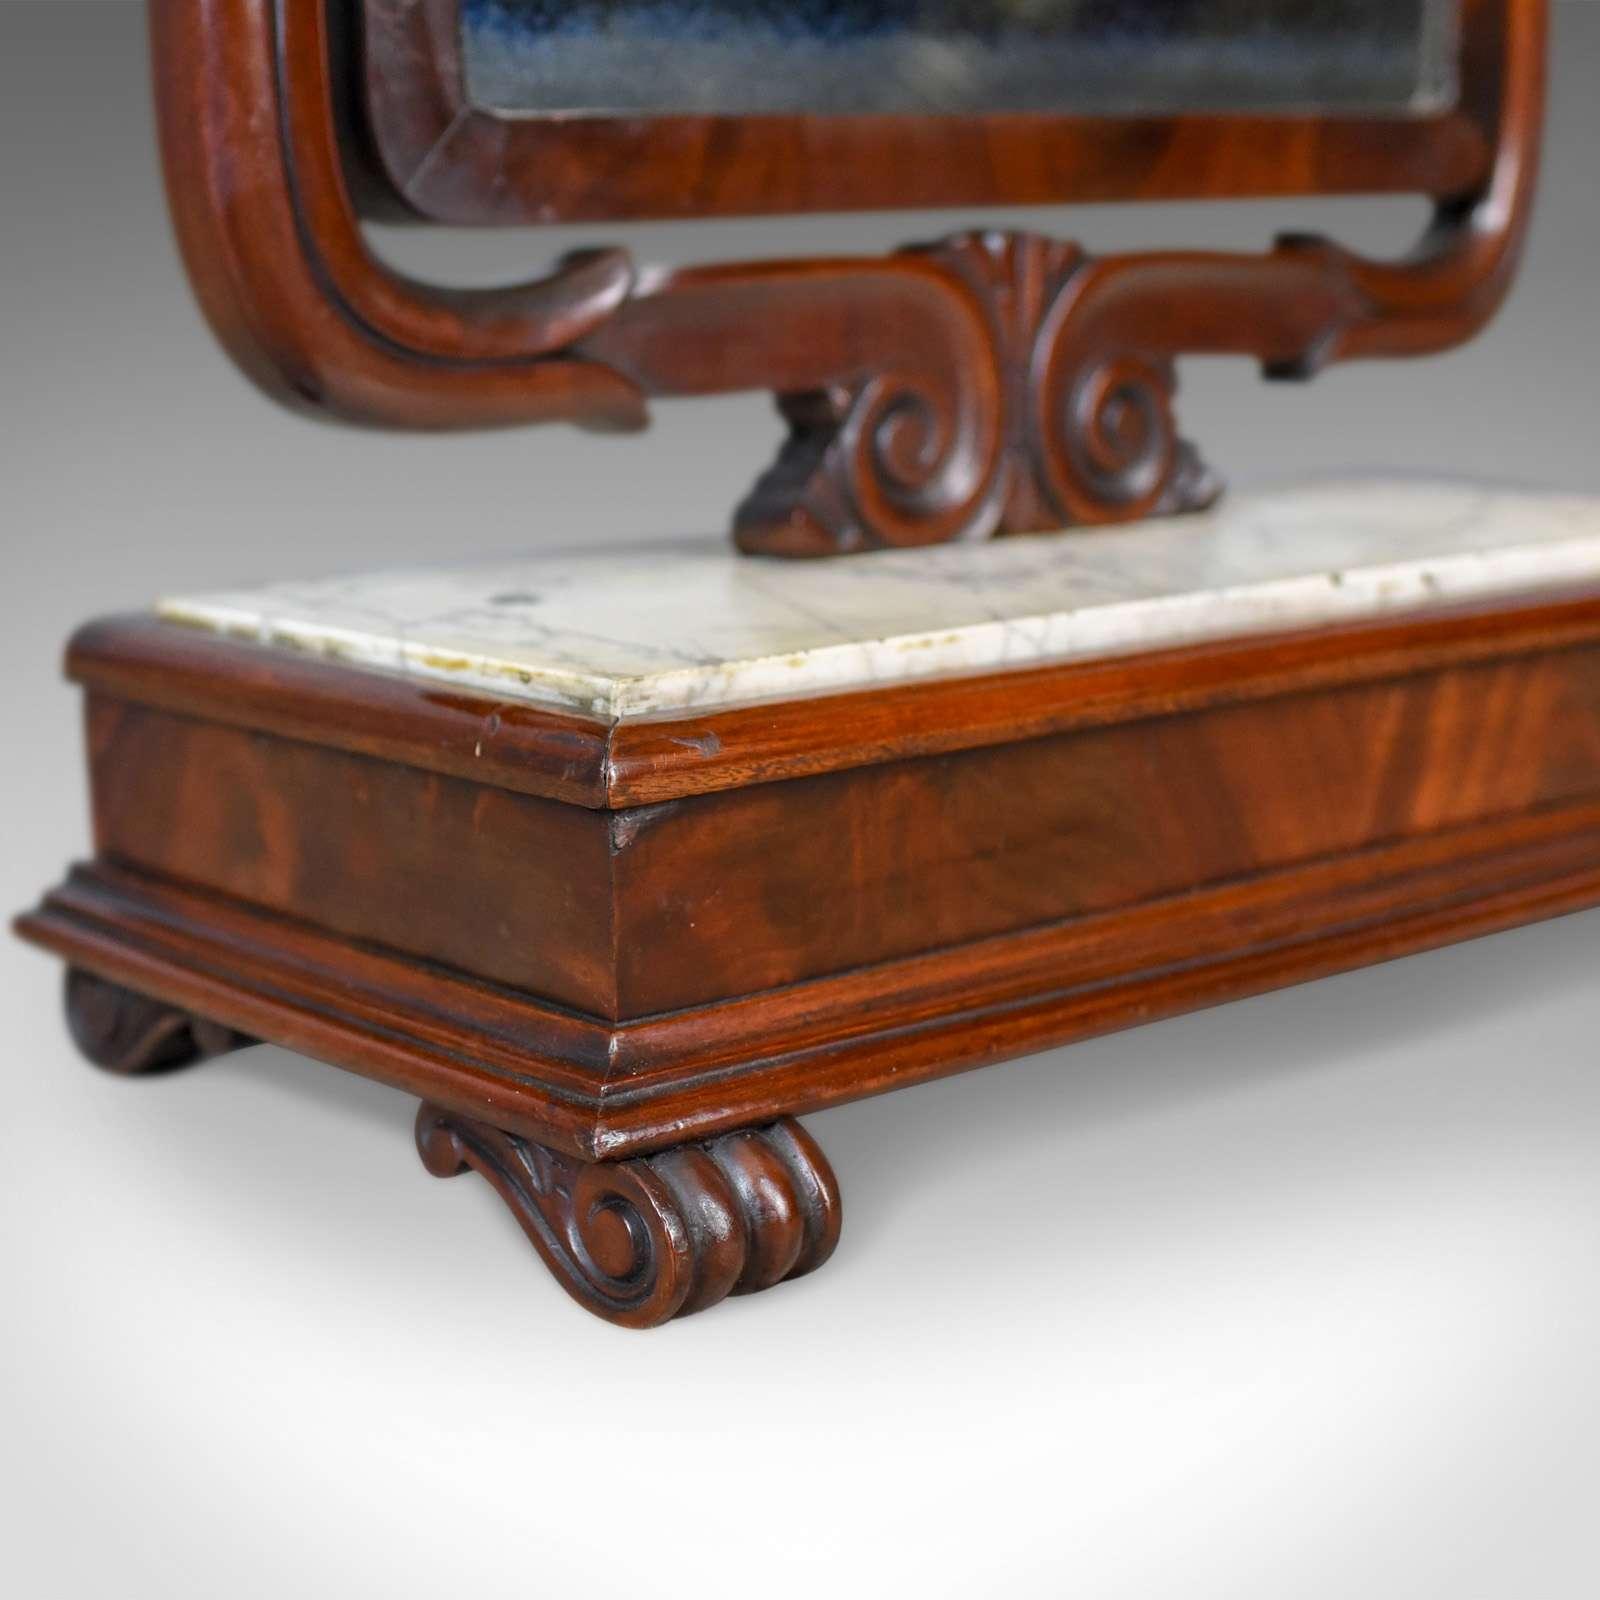 Large Antique Vanity Mirror, Toilet, Swing, English, Victorian Marble Circa 1850